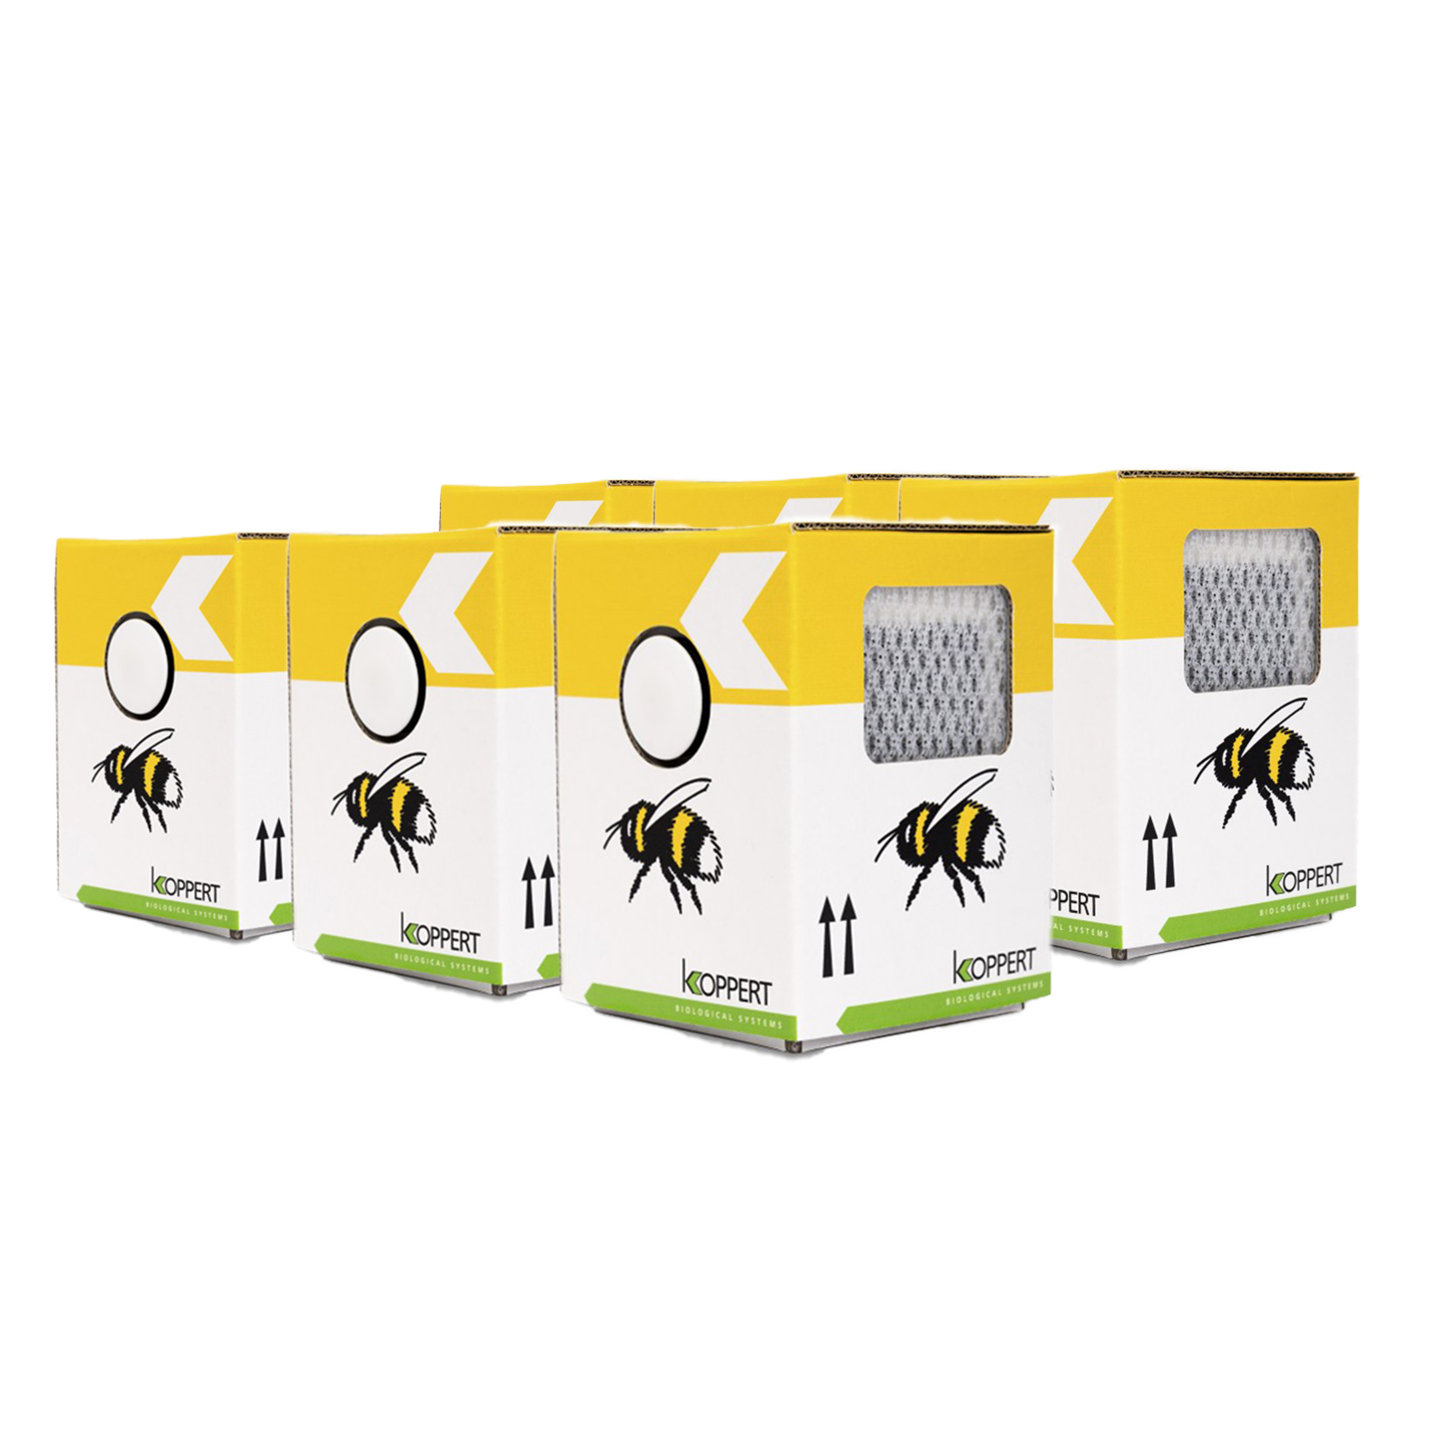 Natupol seeds multipack 6 units